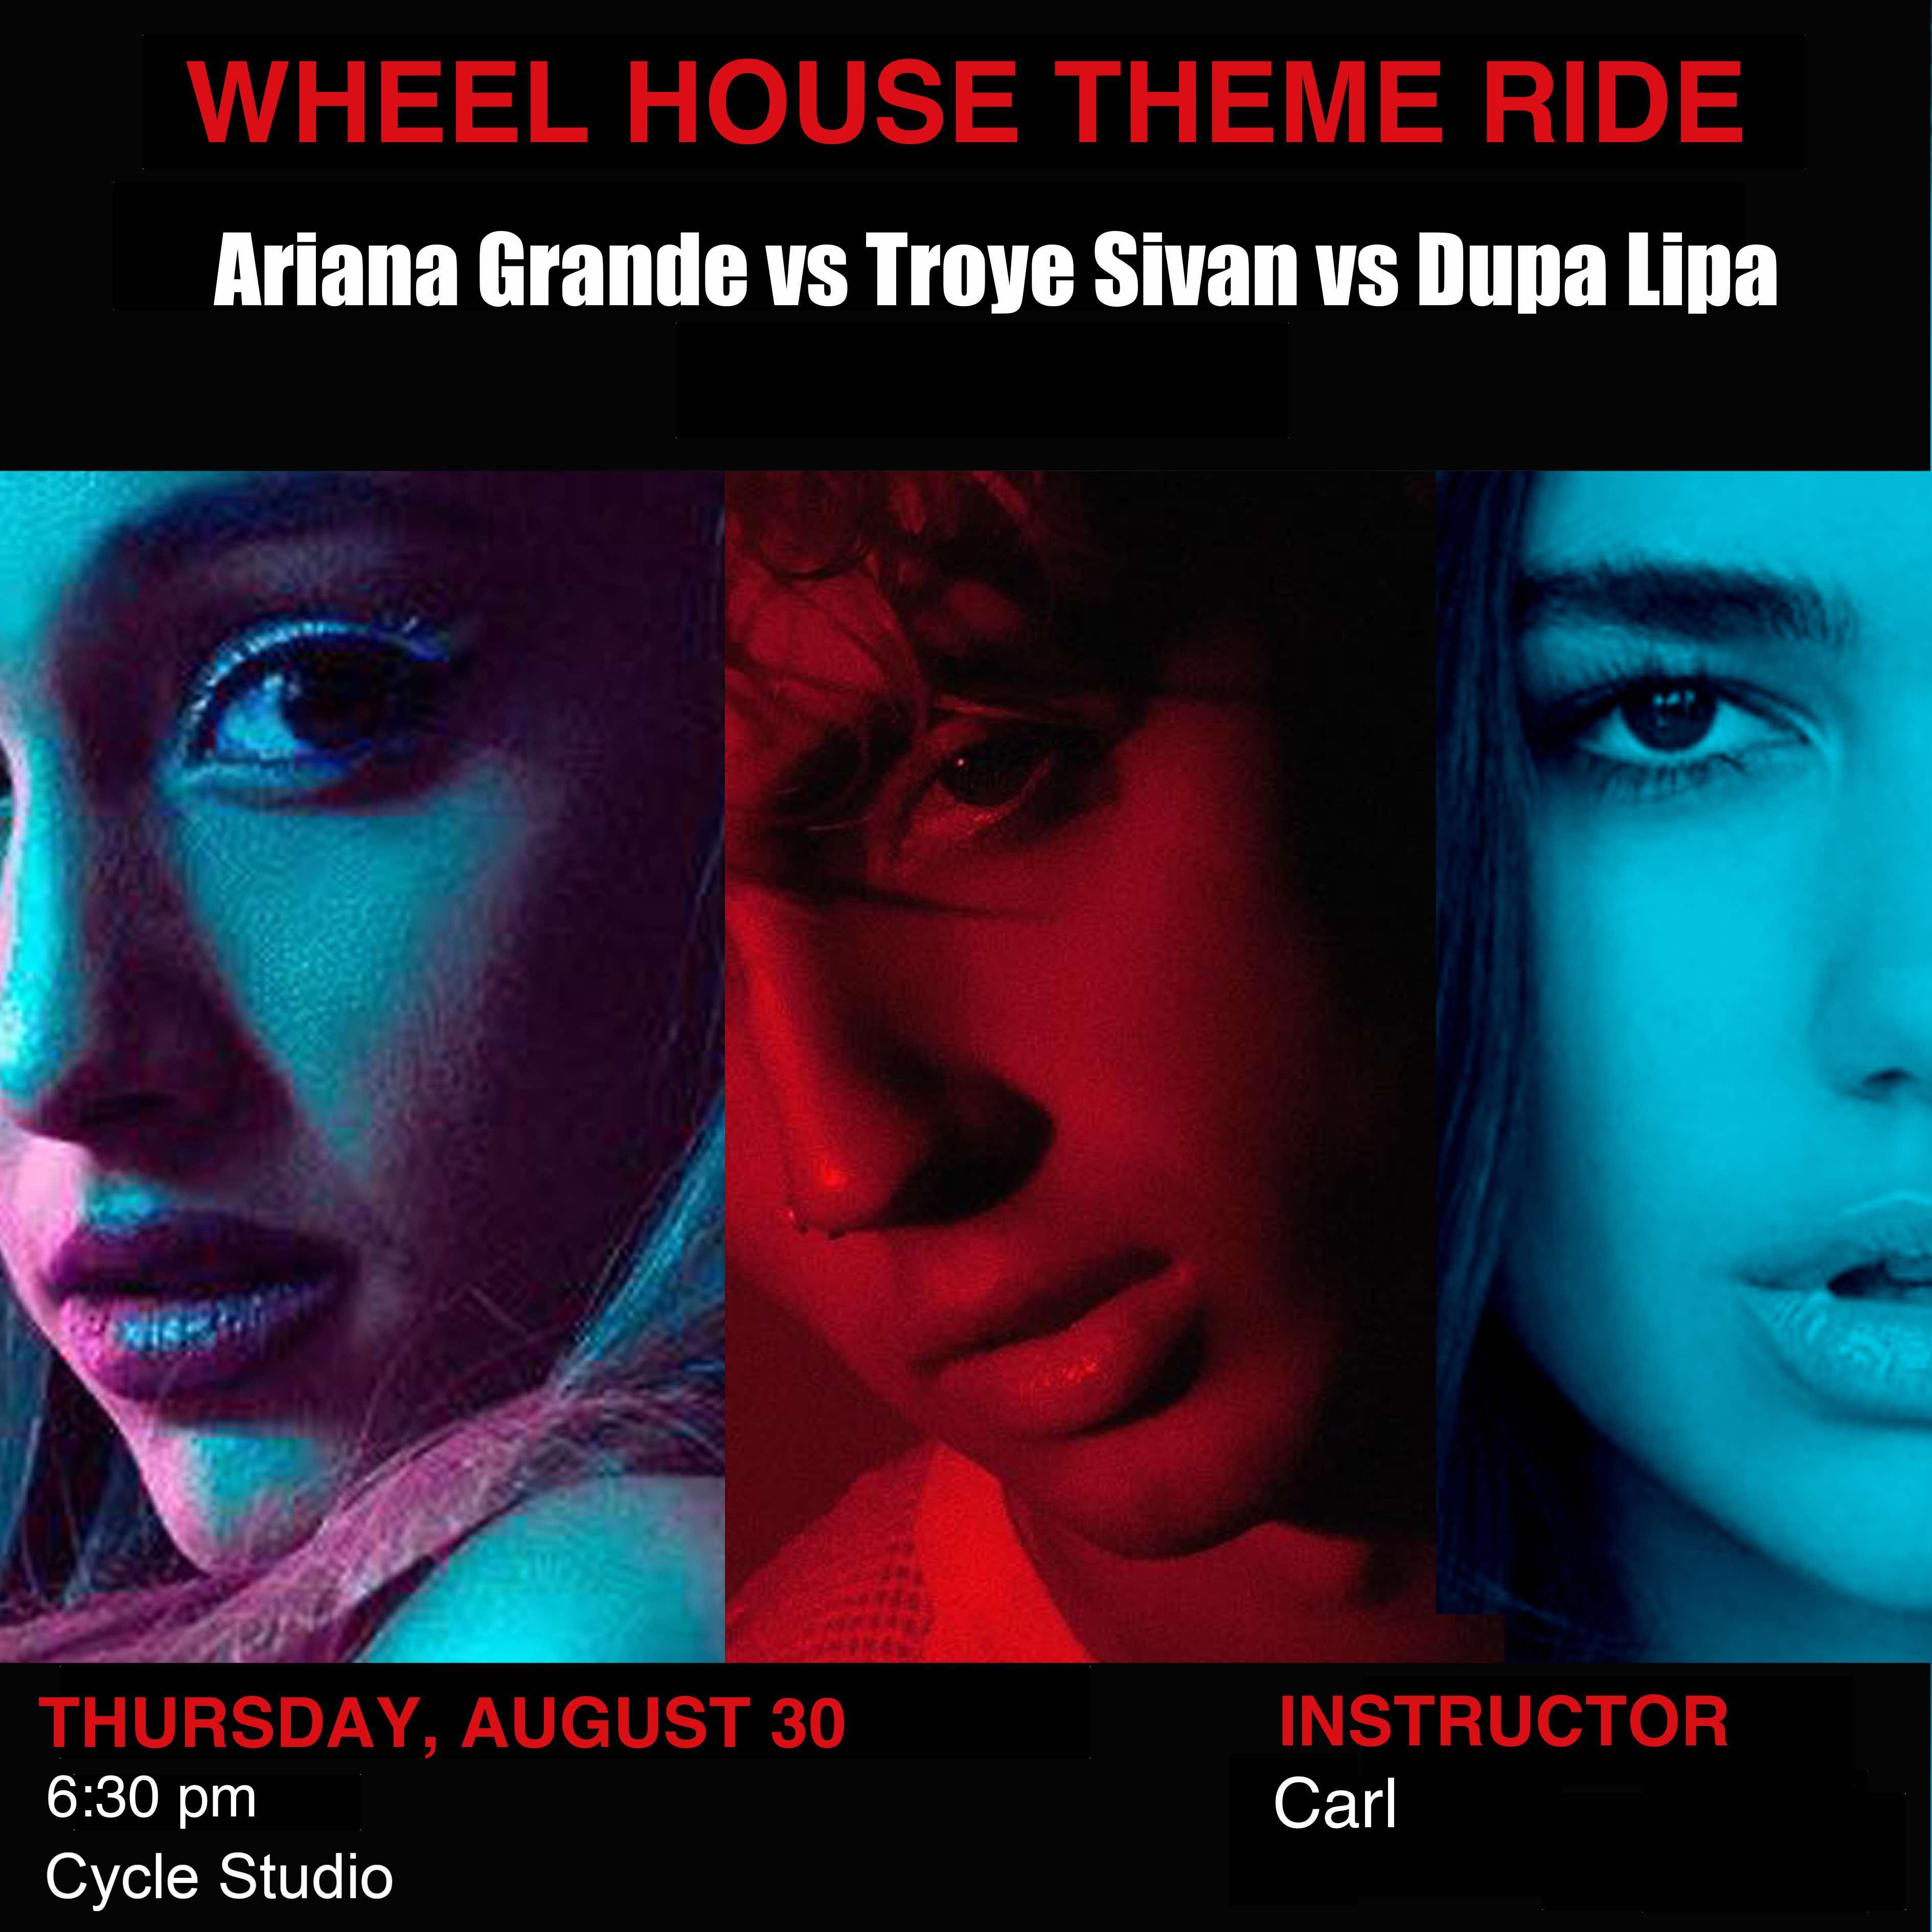 Ariana Grande vs Troye Sivan vs Dupa Lipa